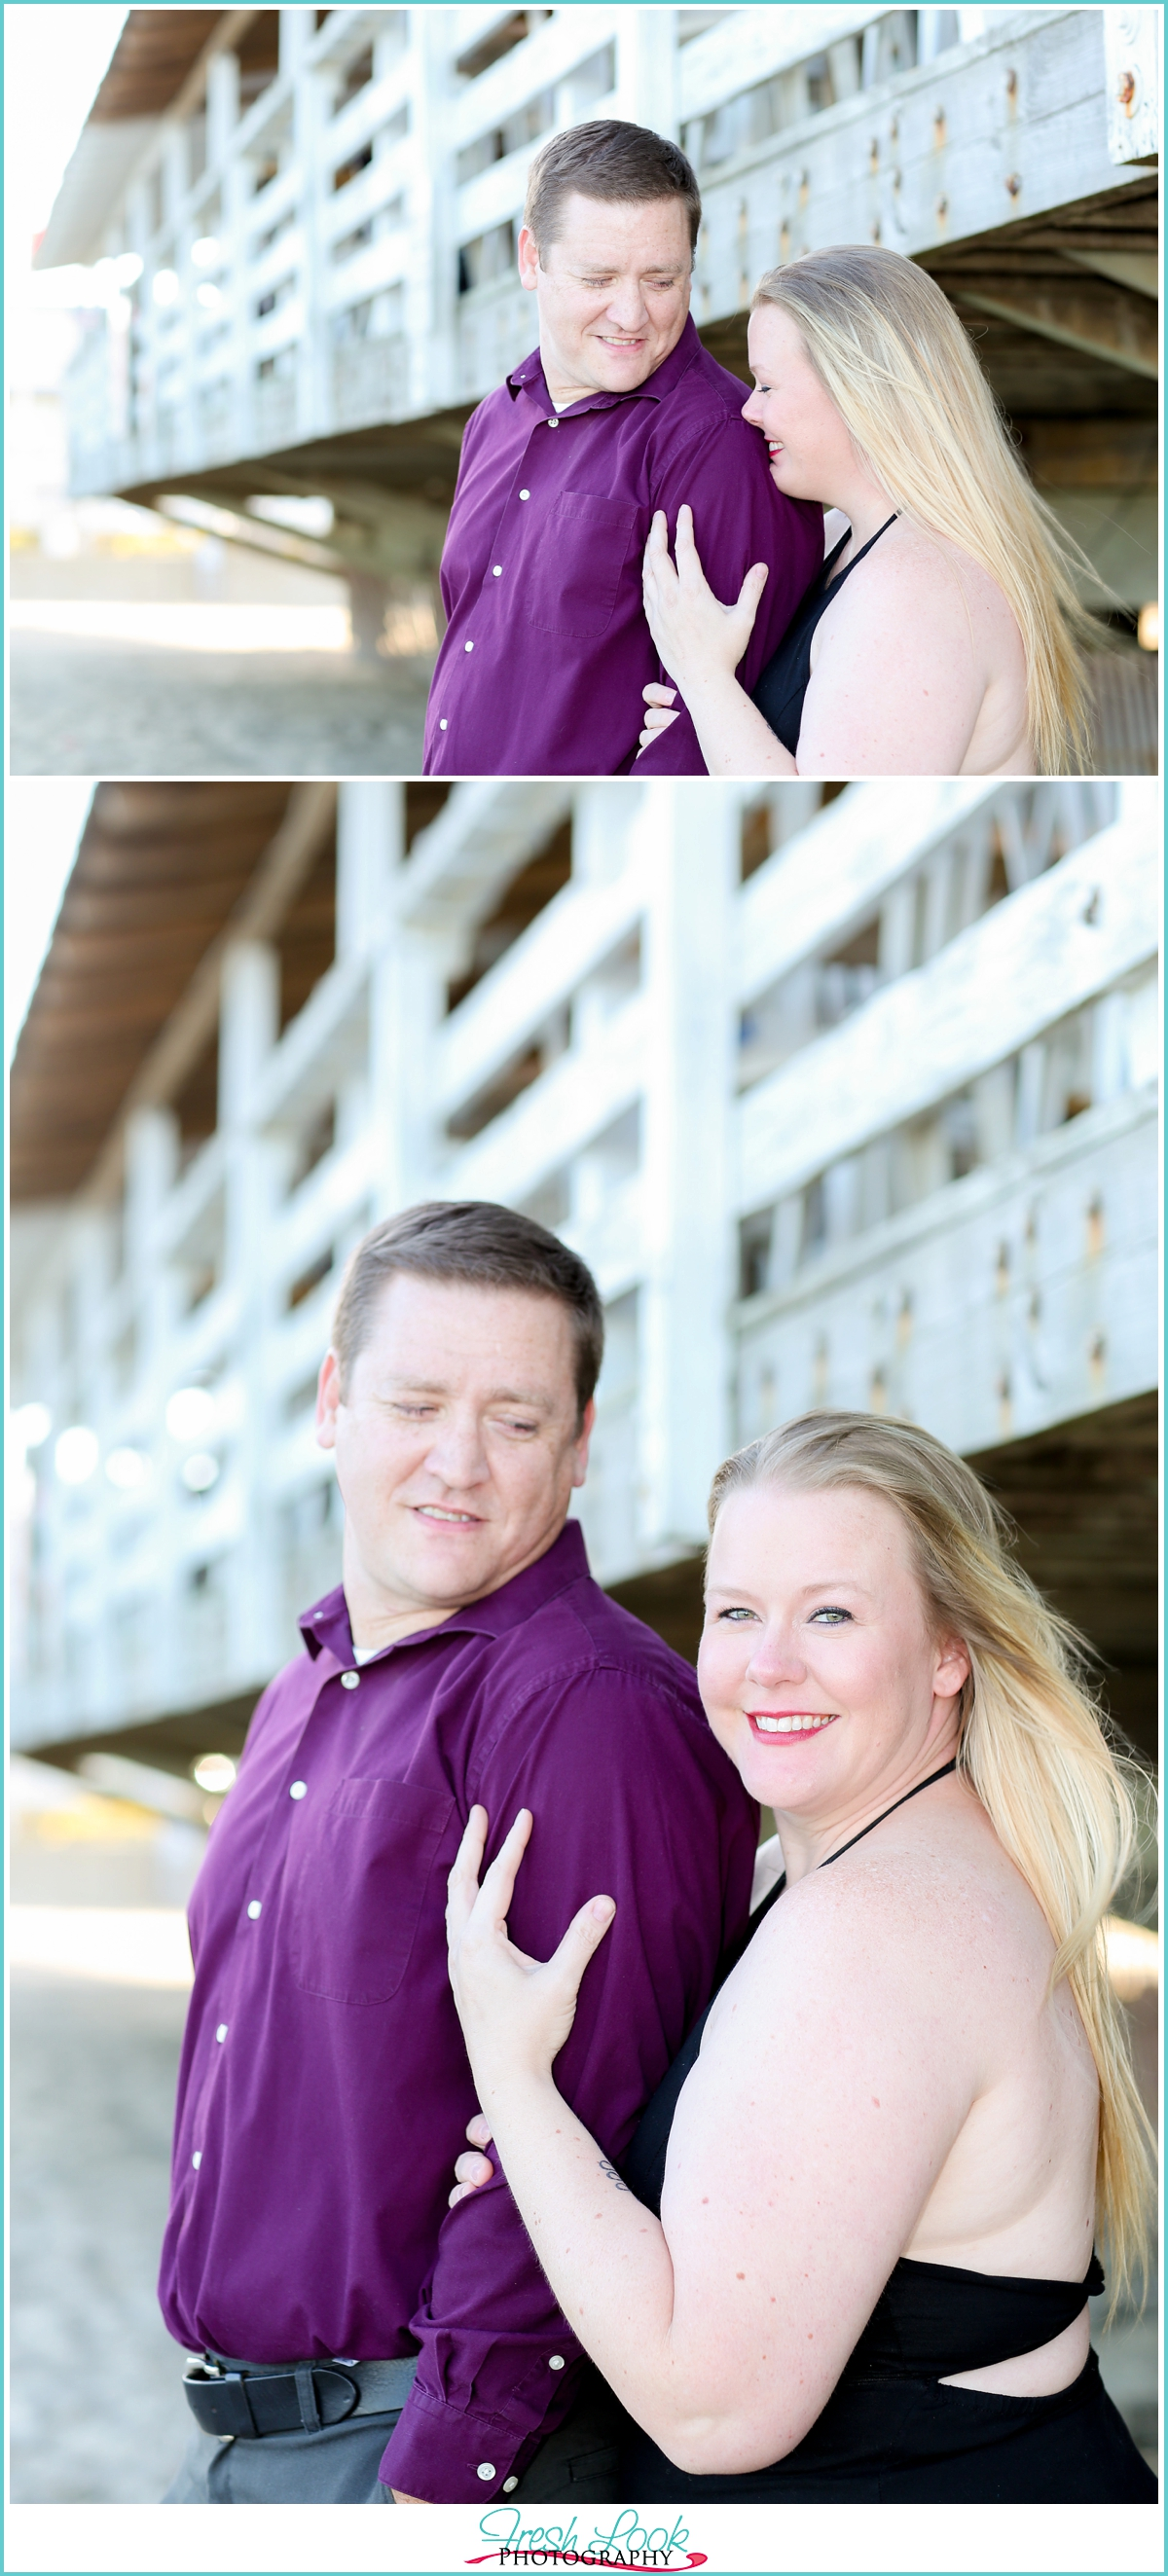 Virginia Beach engagement session photographer